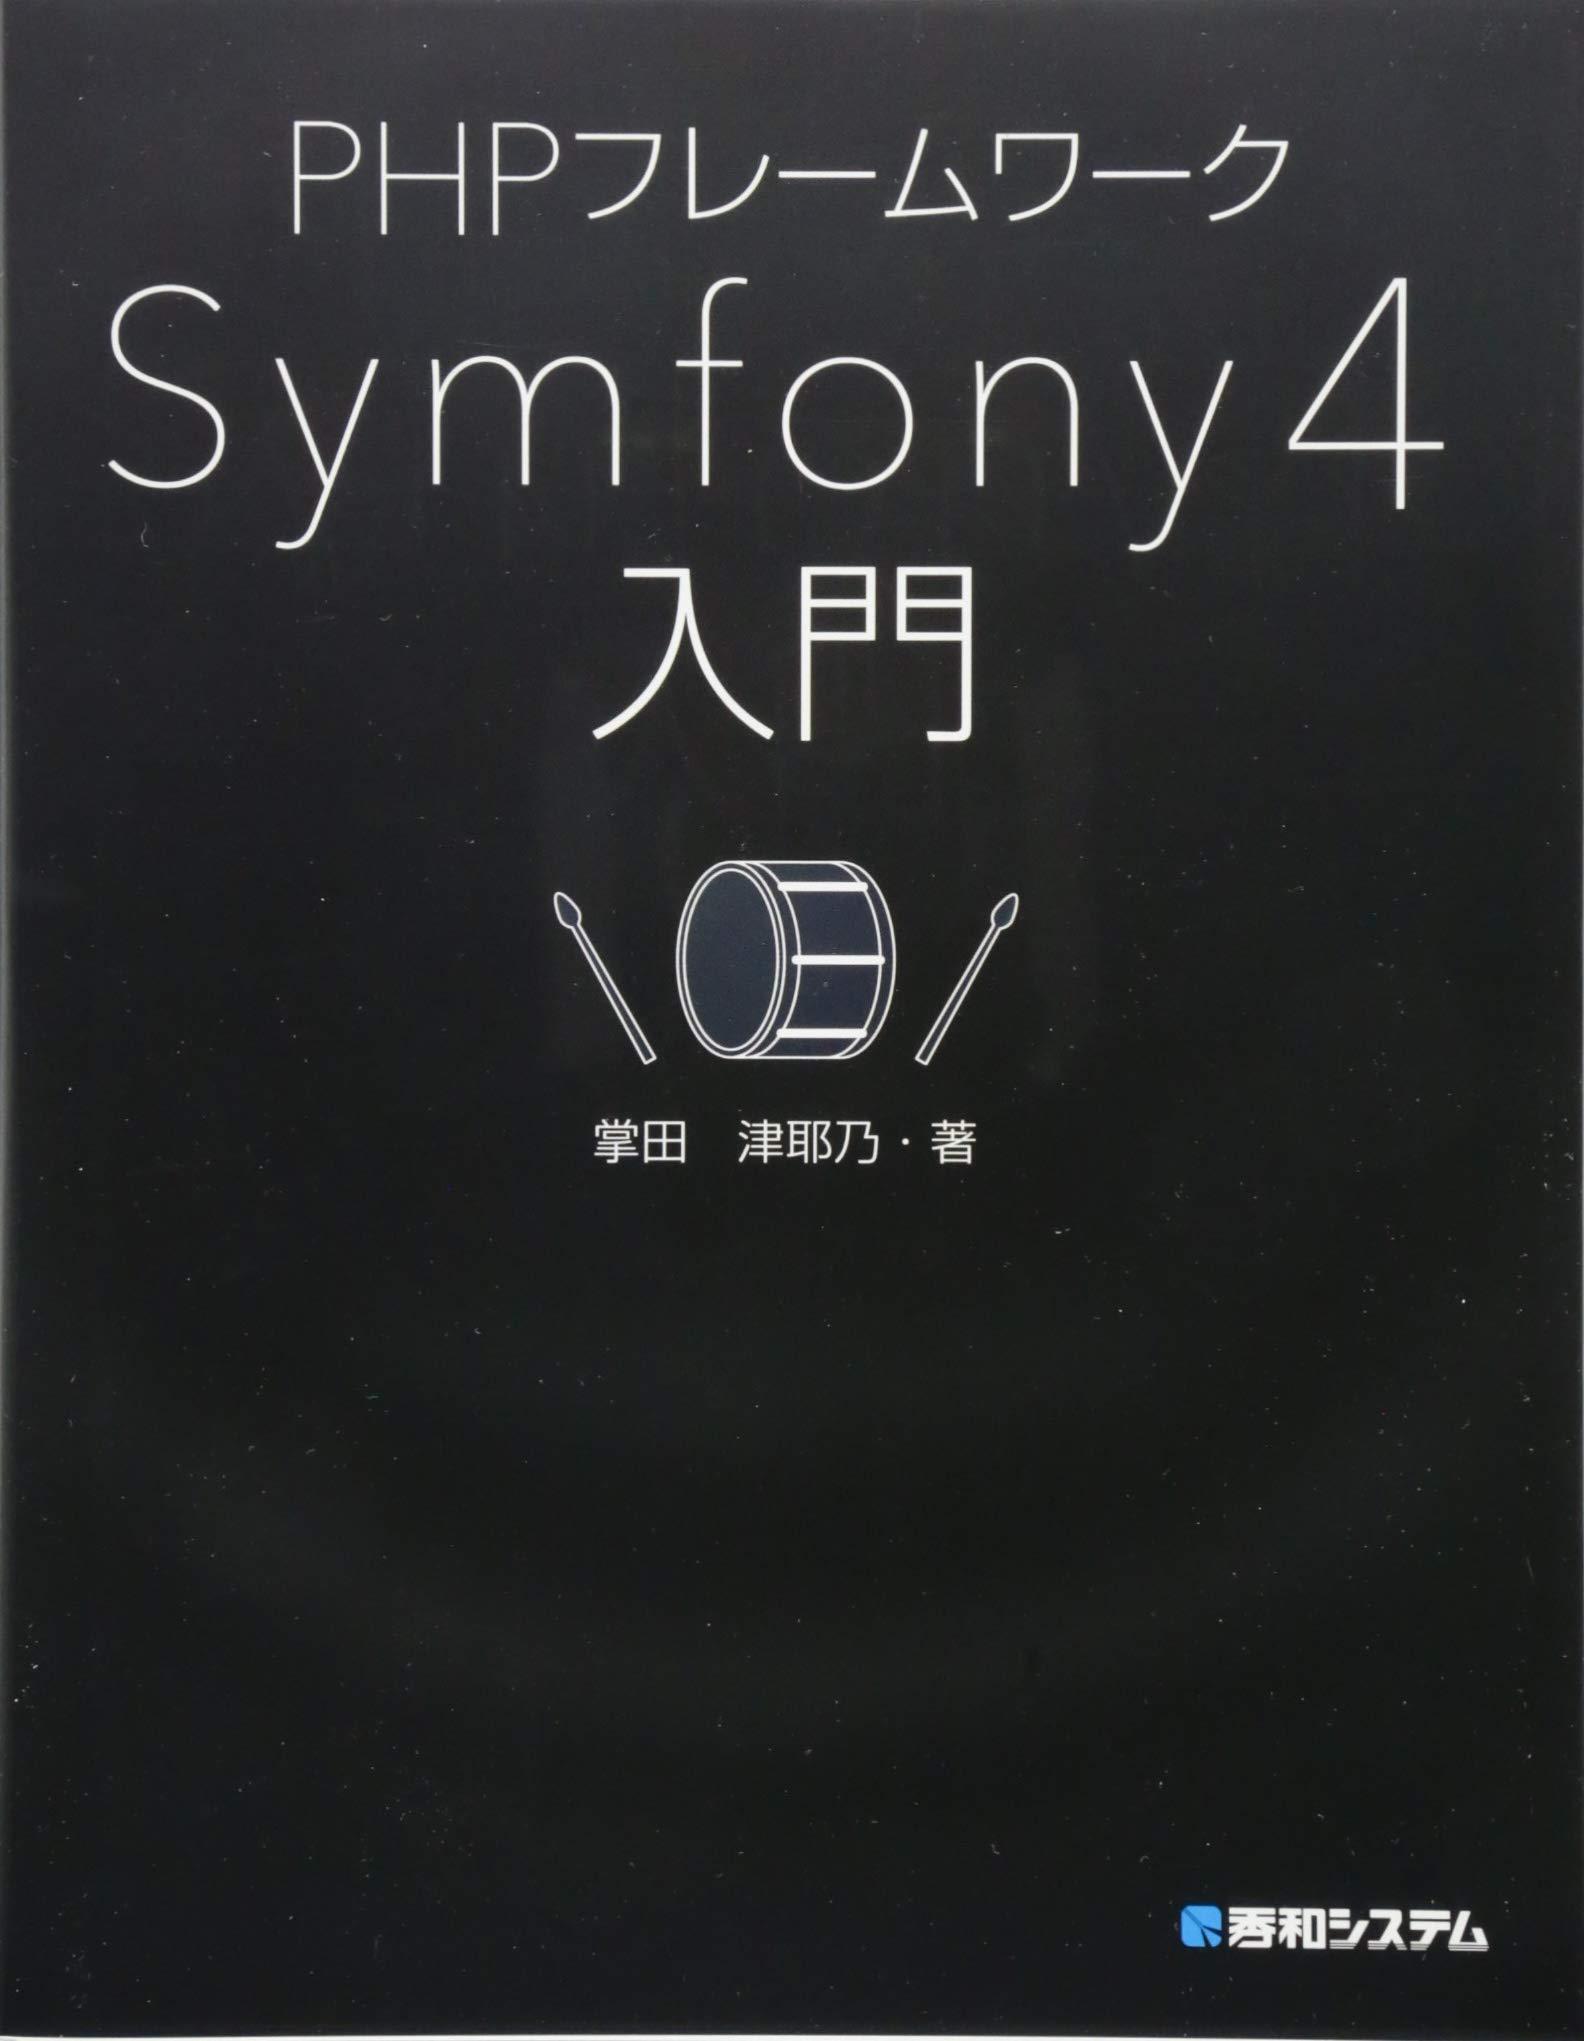 PHPフレームワーク Symfony 4入門